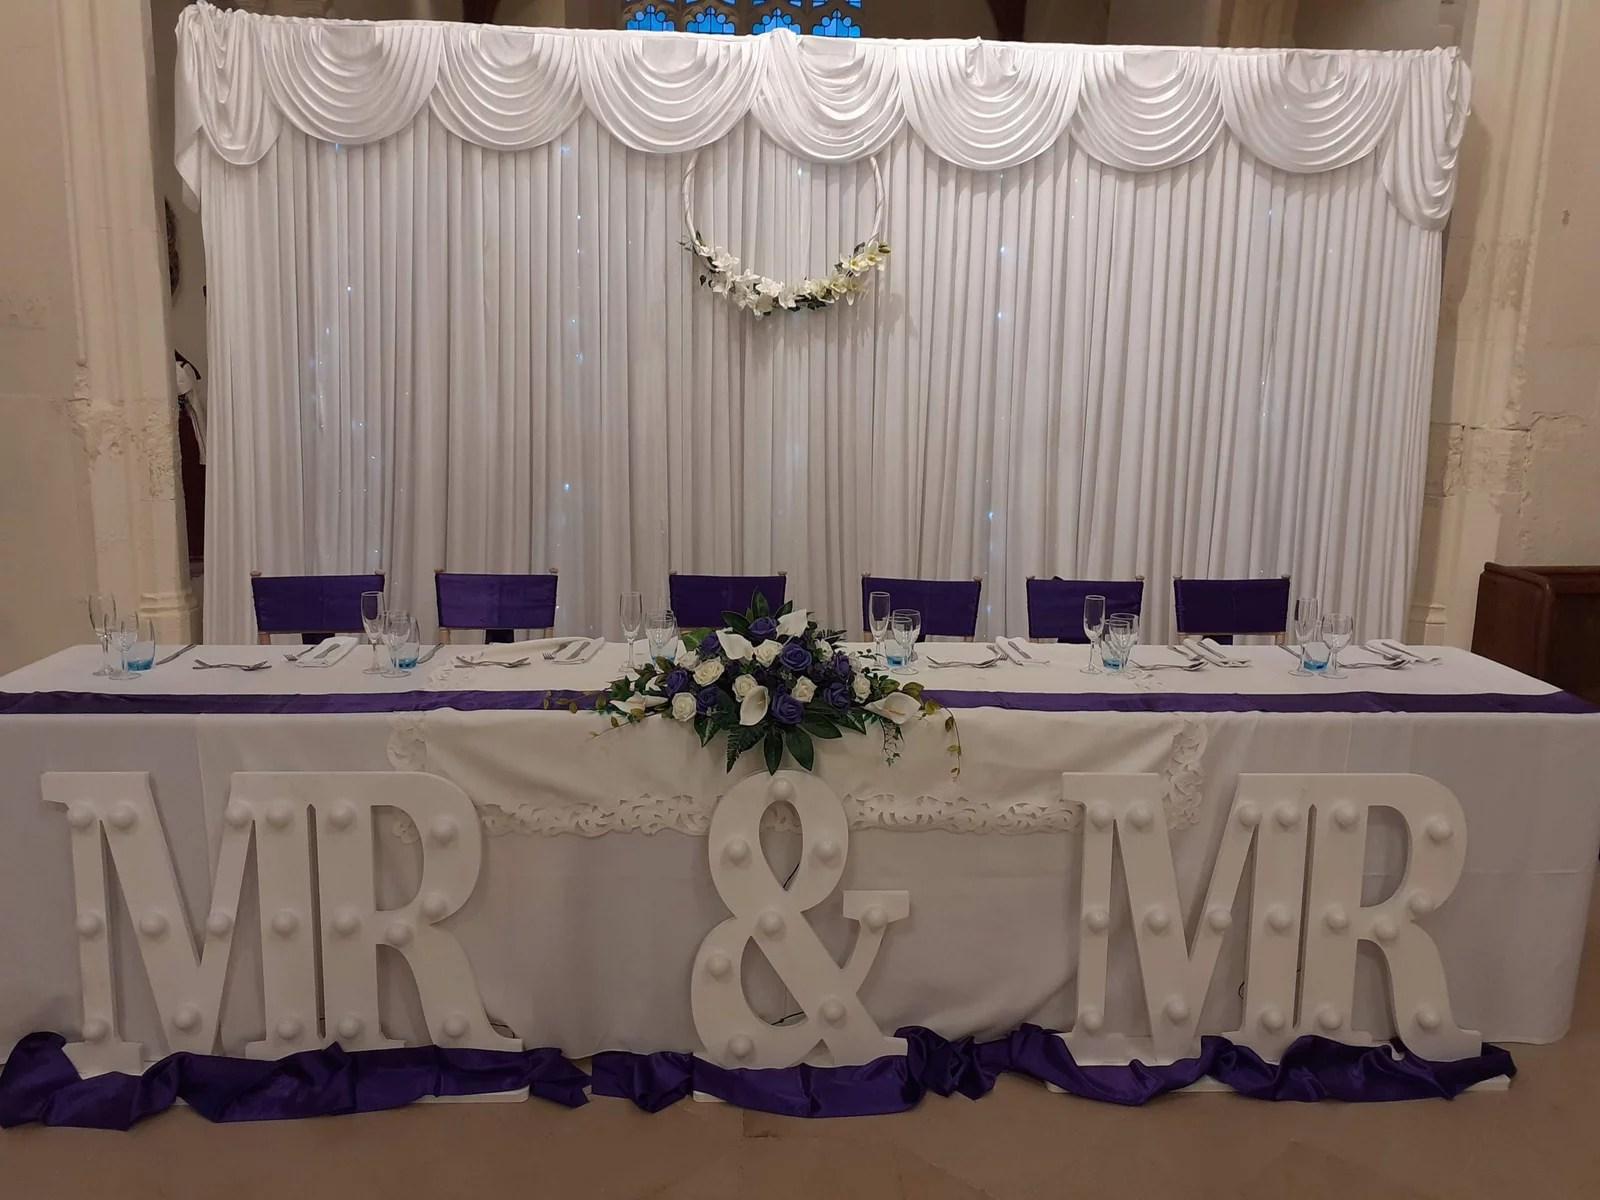 Mr & Mr Sign, Back drop with Purple Satin Theme